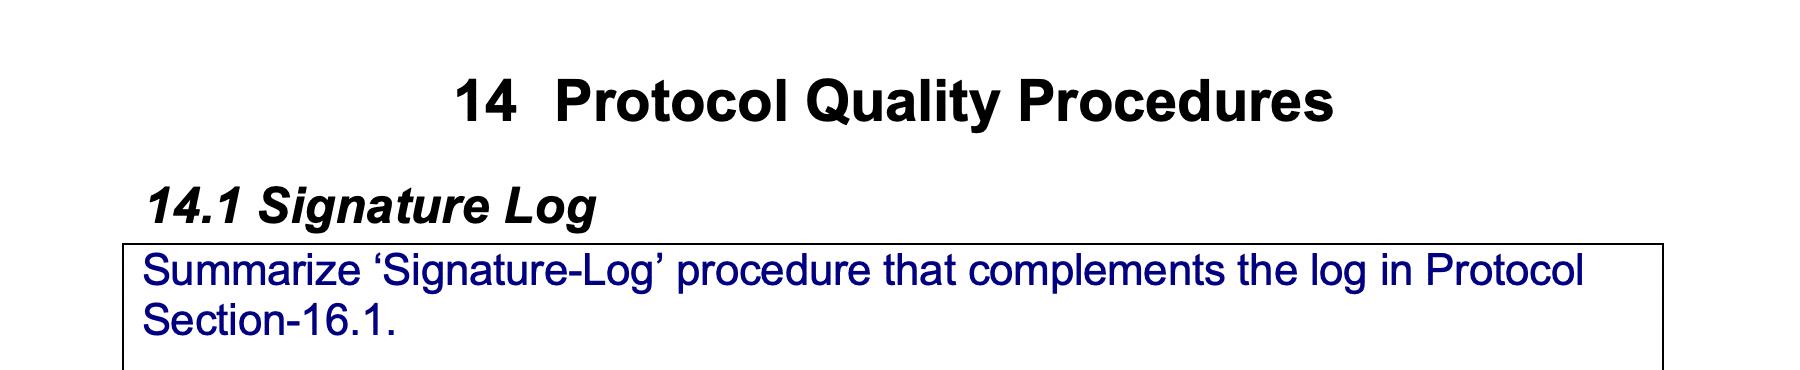 Protocol Quality Procedures GetReskilled